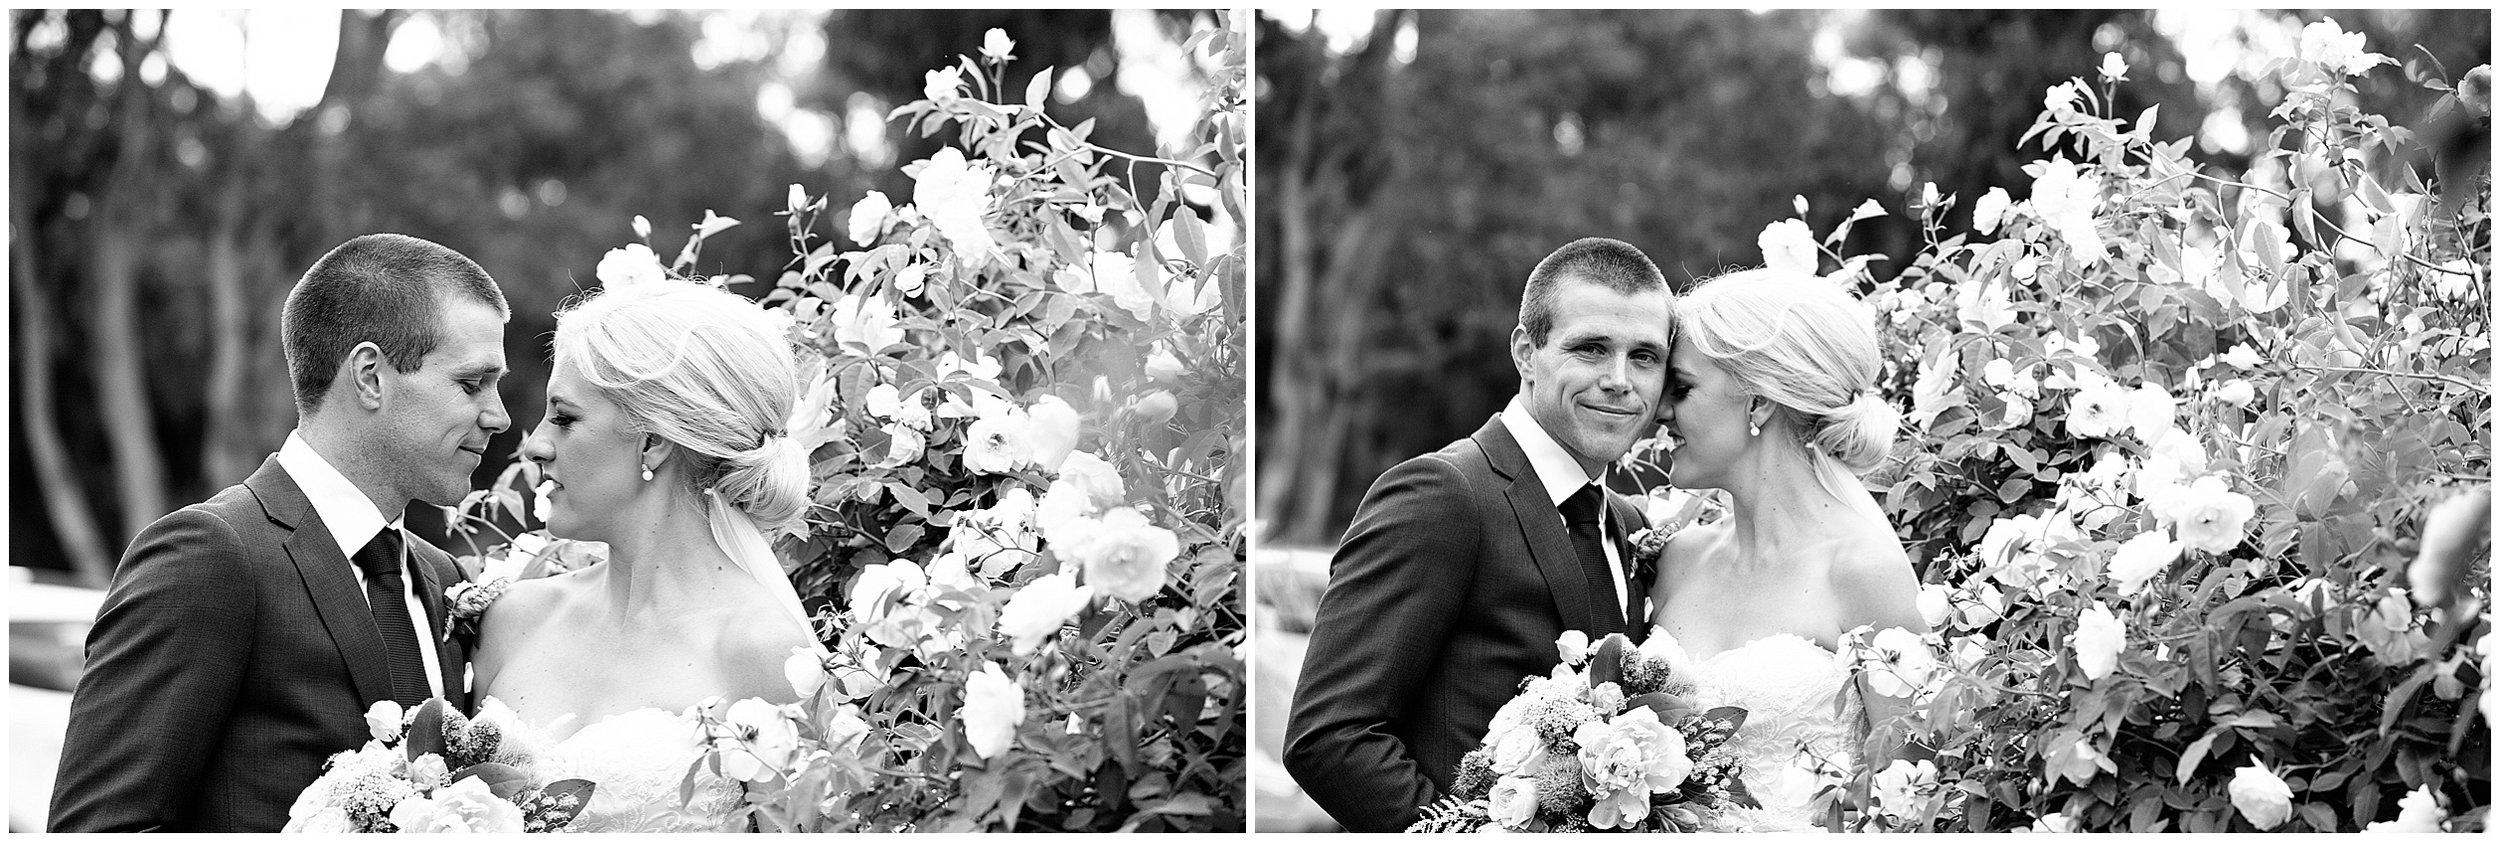 shepparton-wedding-photographer_0121.jpg